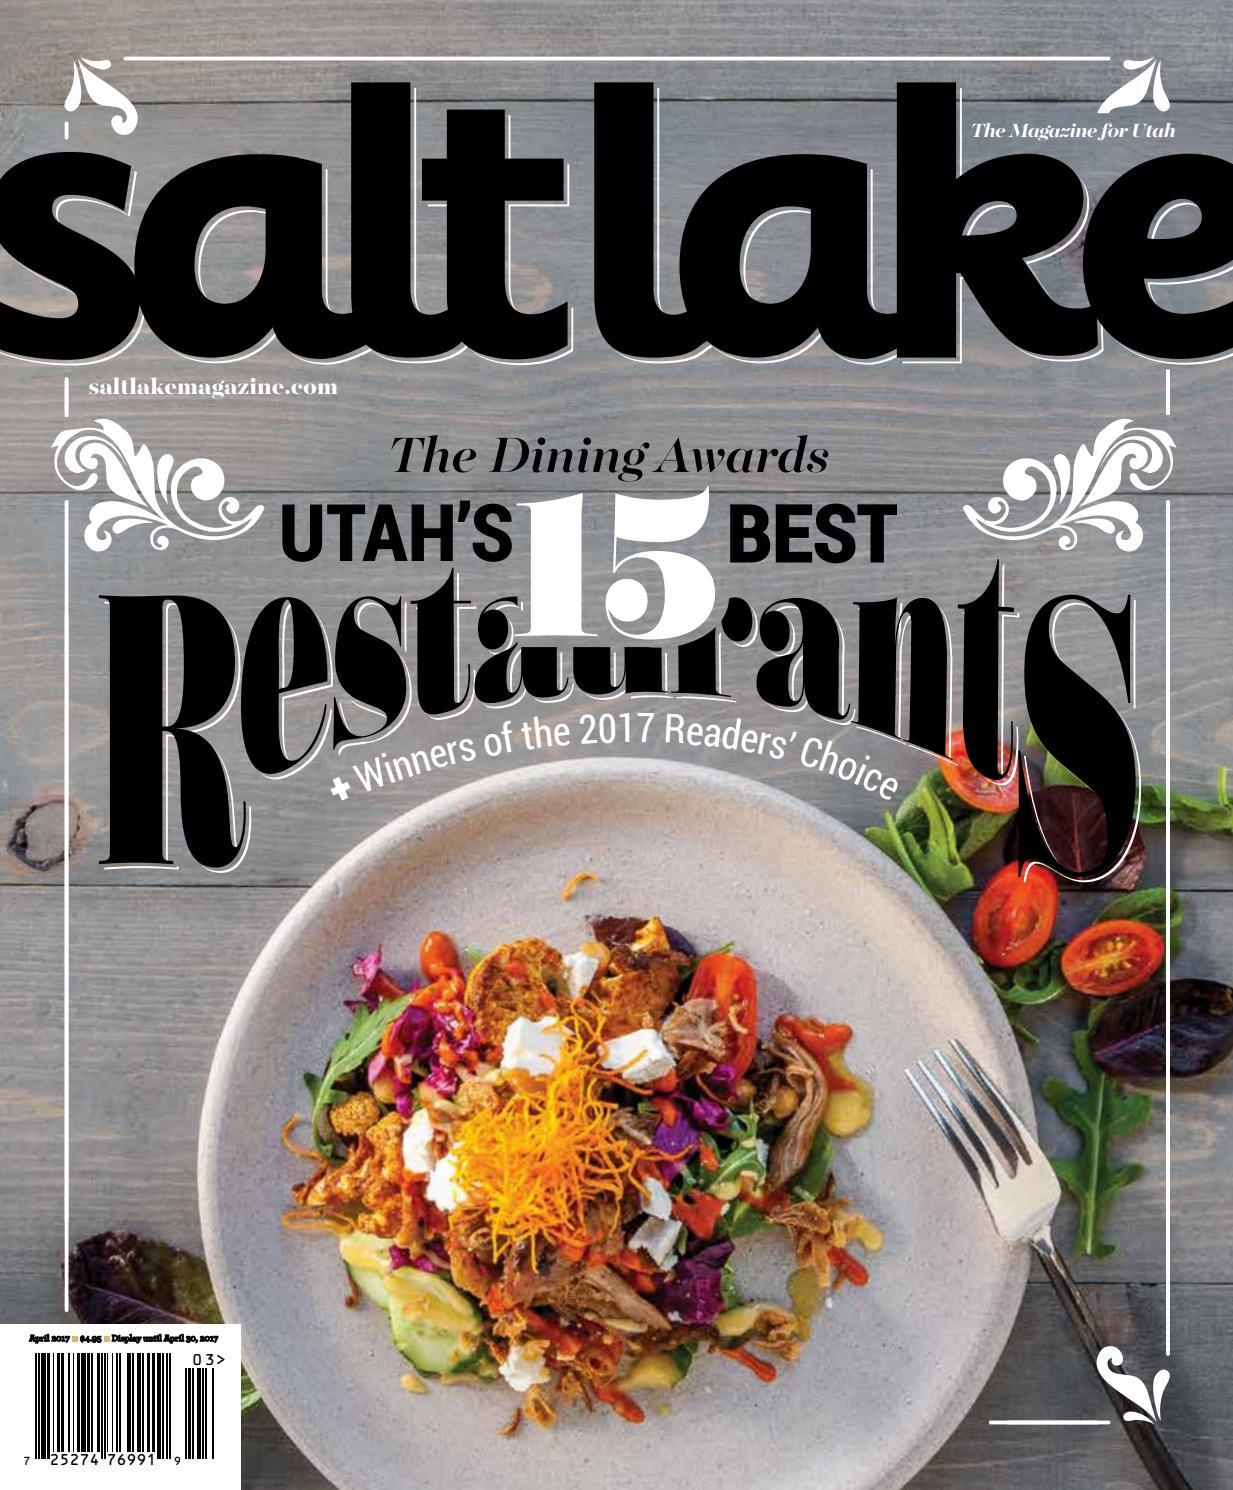 salt lake magazine march april 2017salt lake magazine - issuu